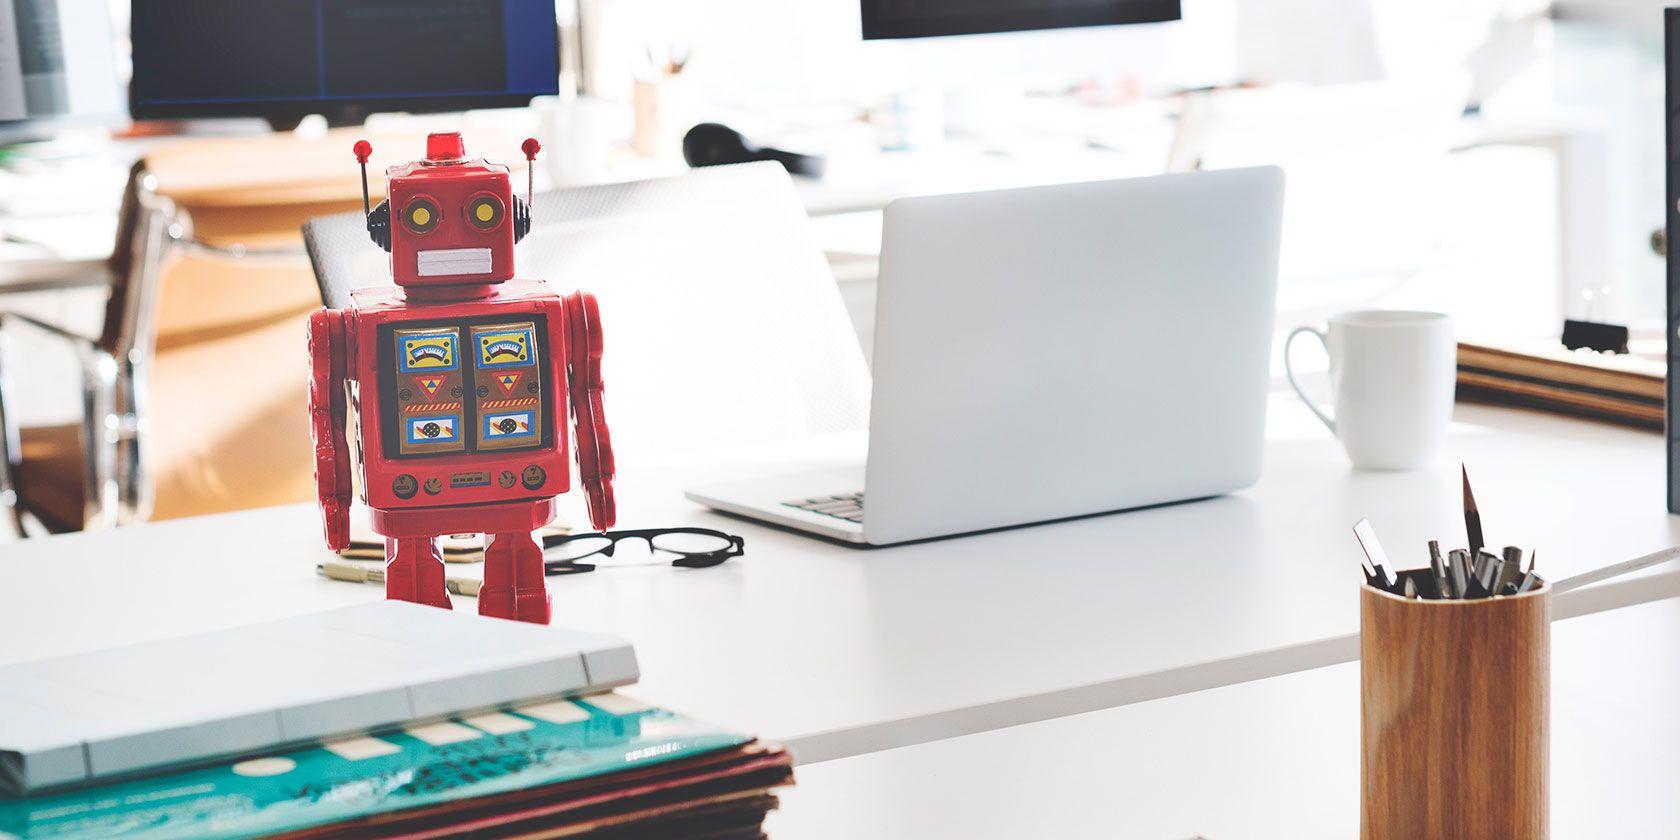 Ian Buckley Smart Technology Robotics Prometheus Pcb Maker Automates Circuit Board Creation Video Voice Sensitive Robot